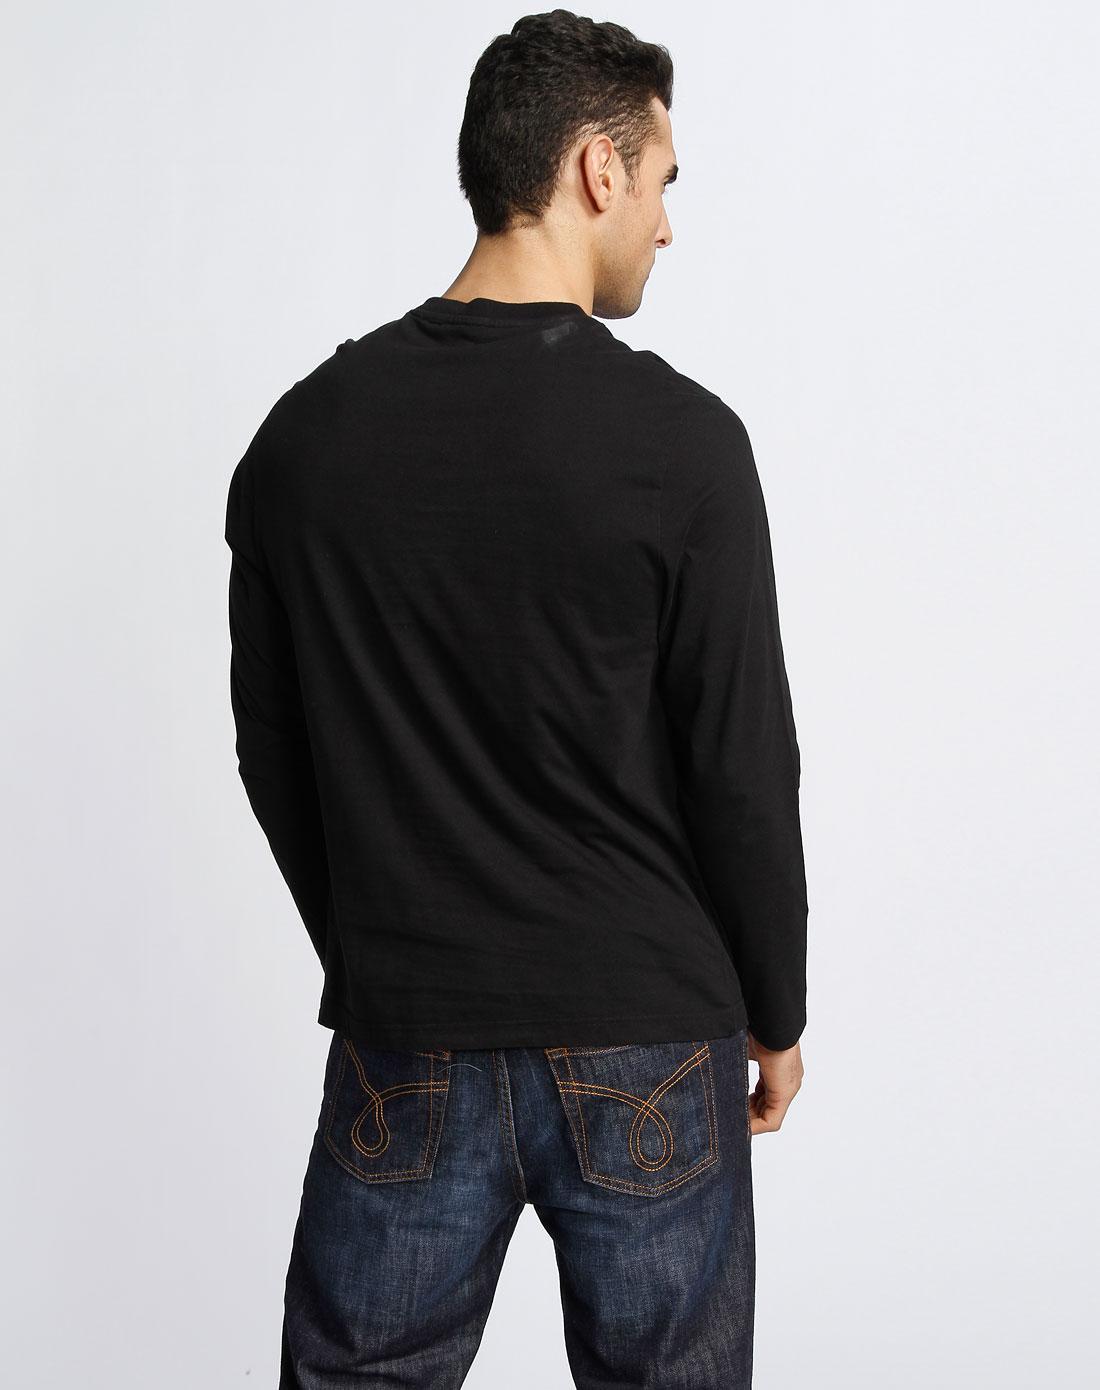 男�ya[�X�~[�Y�X�_ck 男款纯黑色圆领长袖t恤1